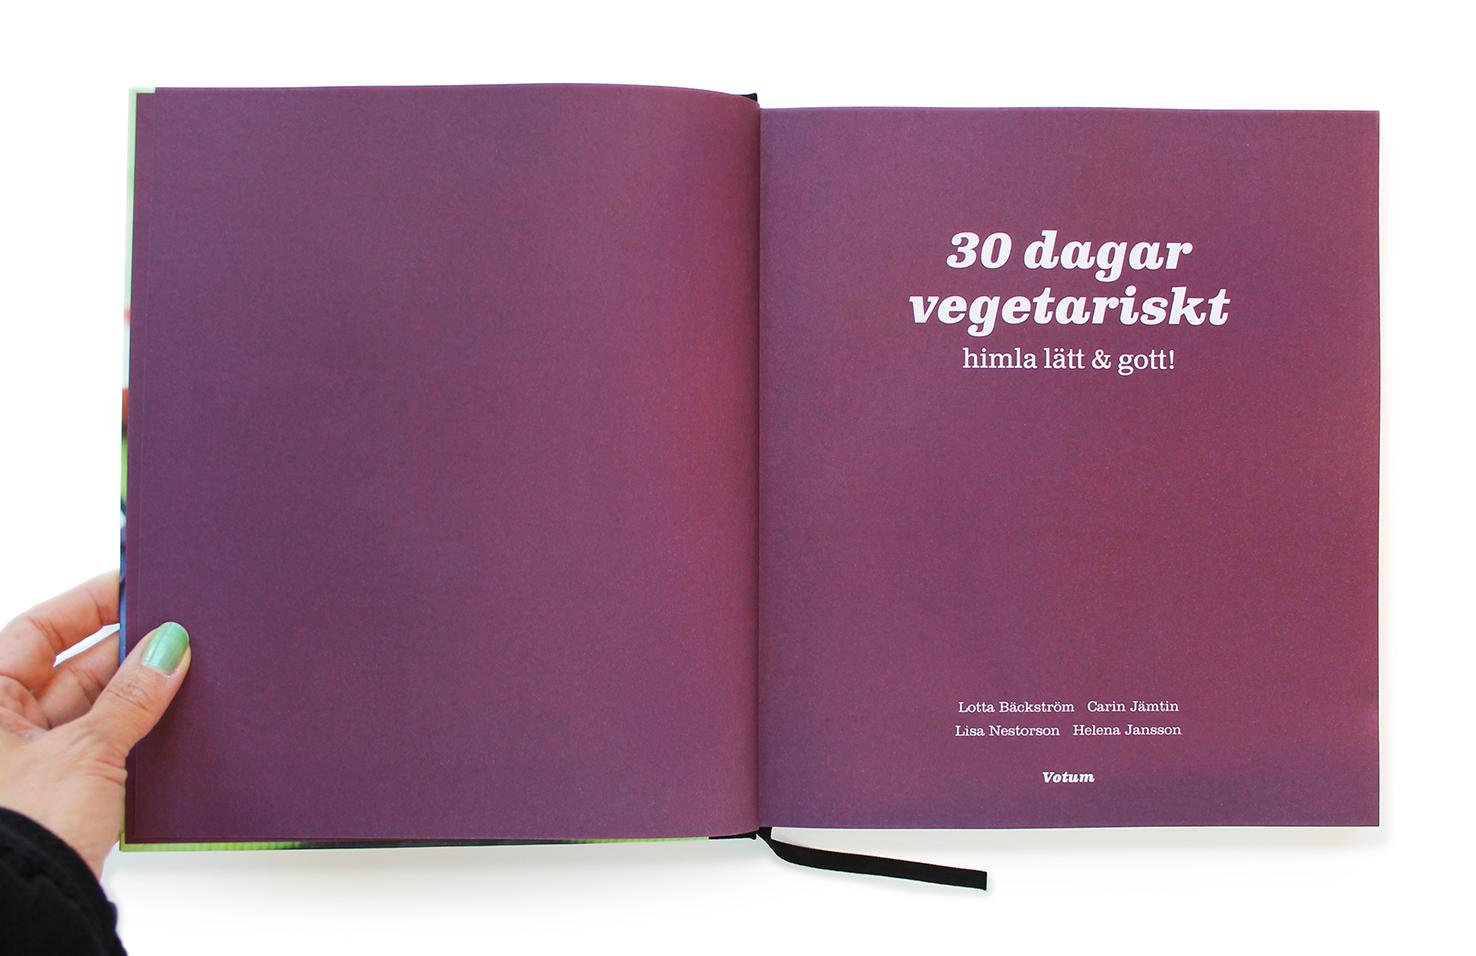 30_dagar_veg_1